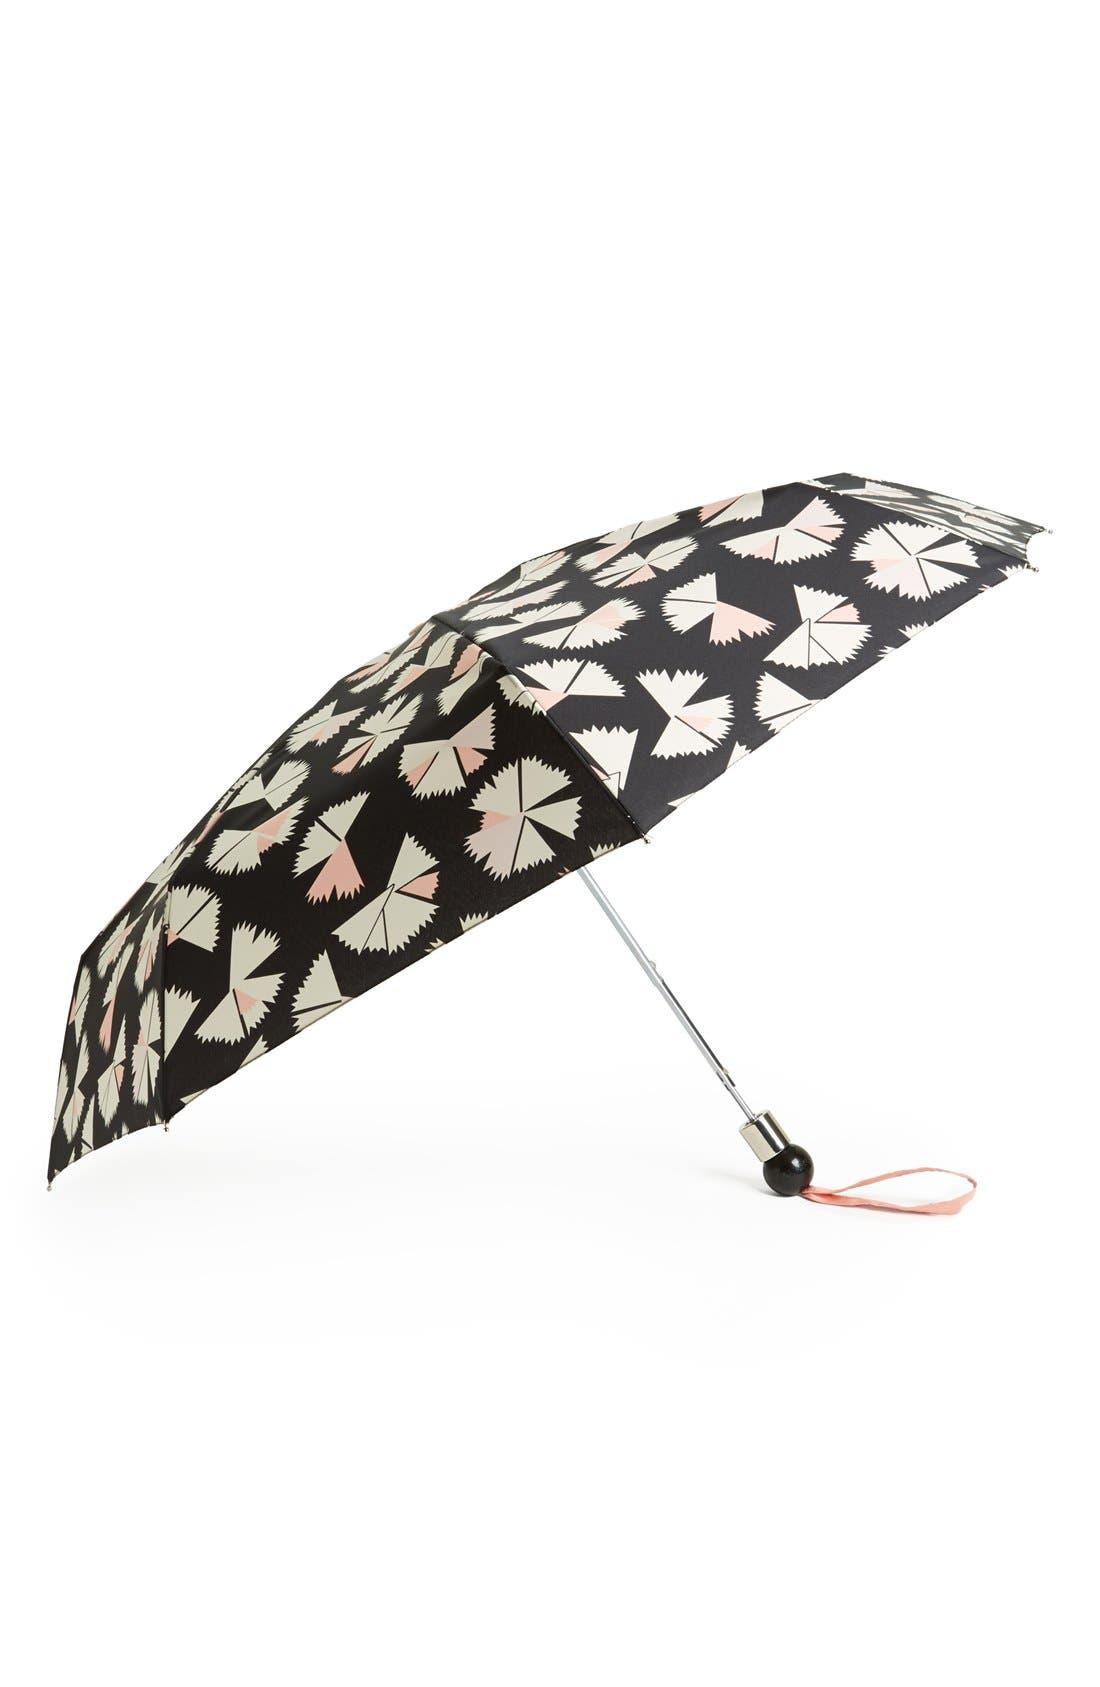 Alternate Image 1 Selected - MARC BY MARC JACOBS 'Pinwheel' Umbrella